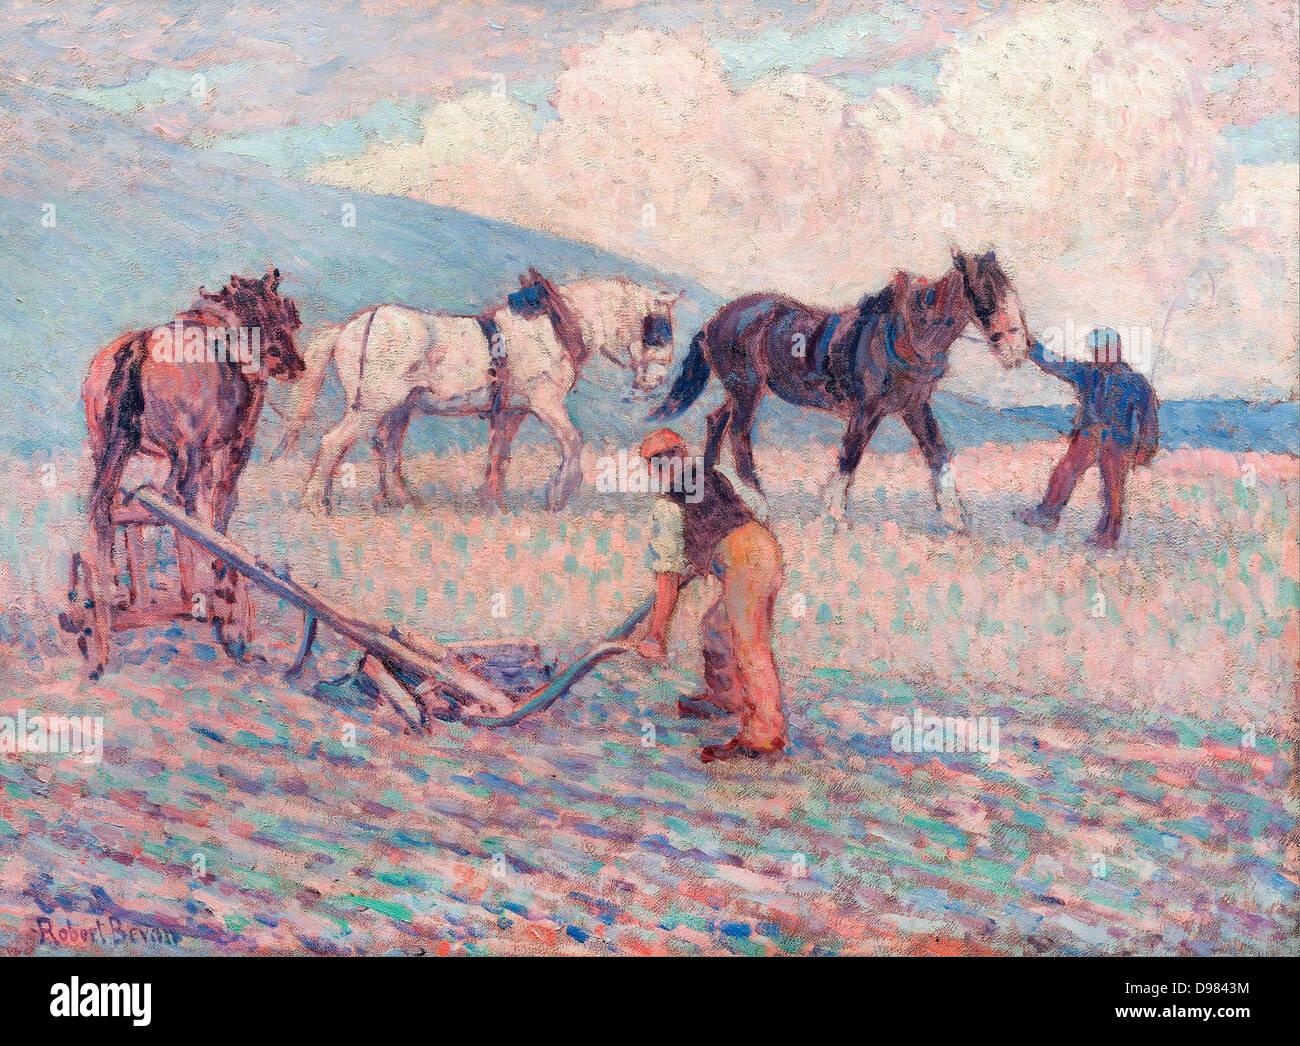 Robert Bevan, Le Rice-Plow son tour, Sussex. Vers 1909. Huile sur toile. Yale Center for British Art, New Haven, Photo Stock